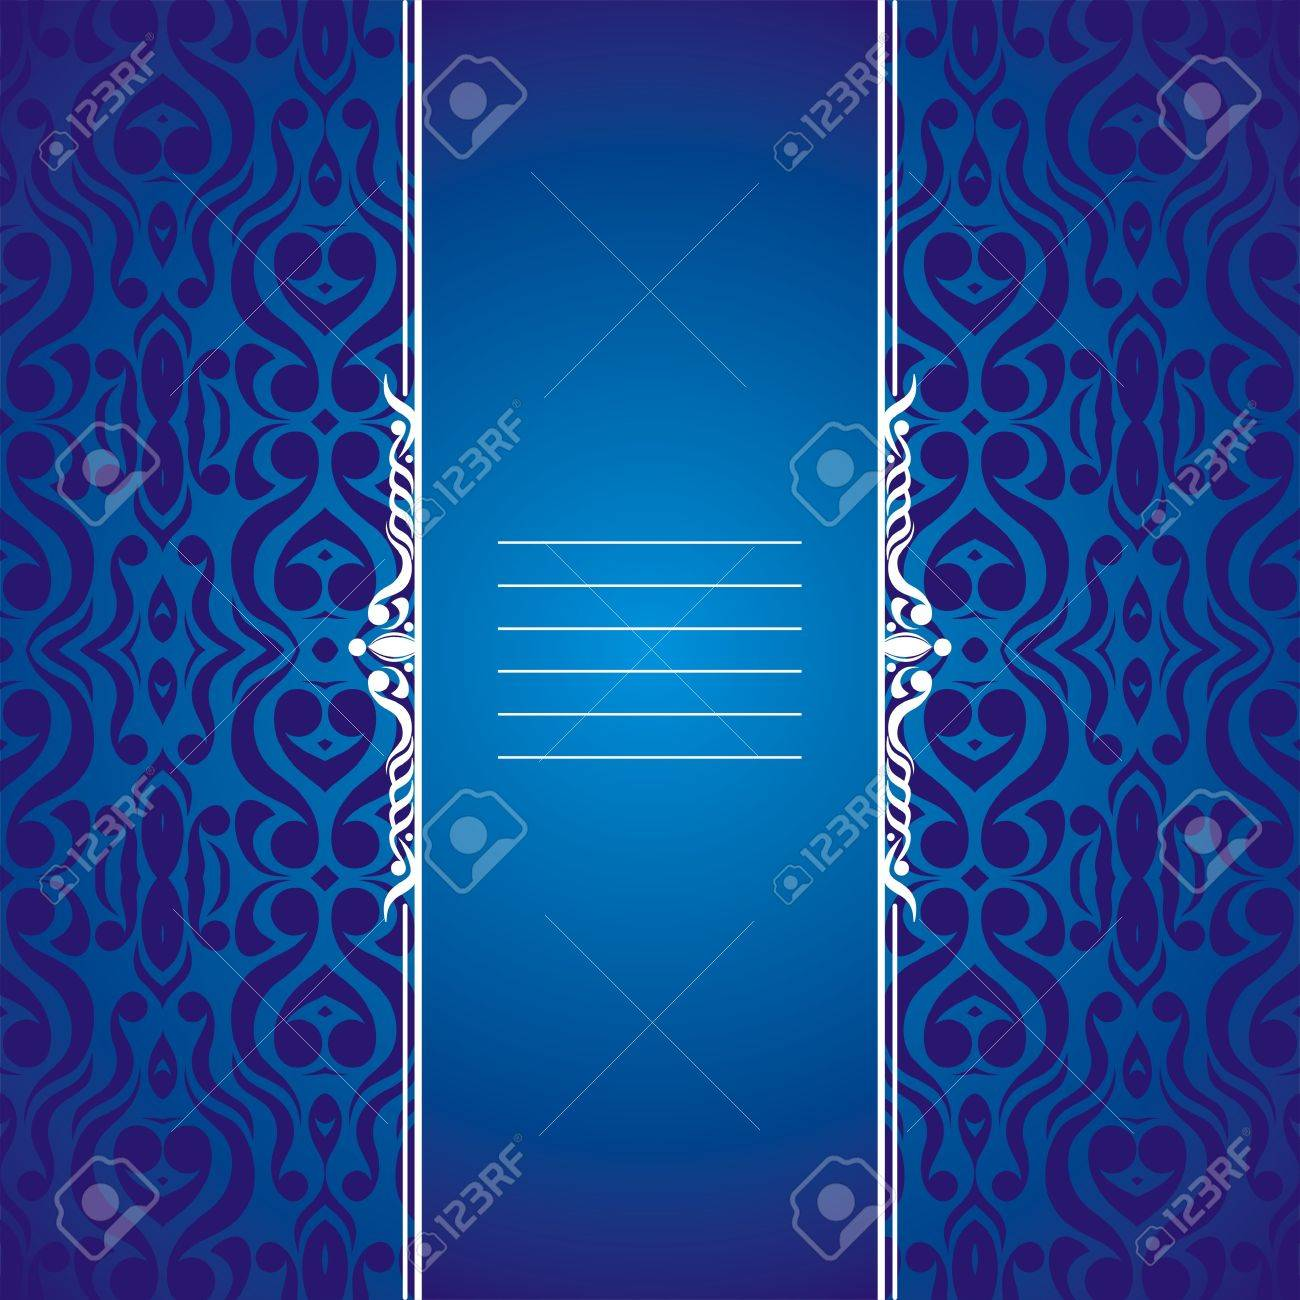 Cover Design Stock Vector - 11369480